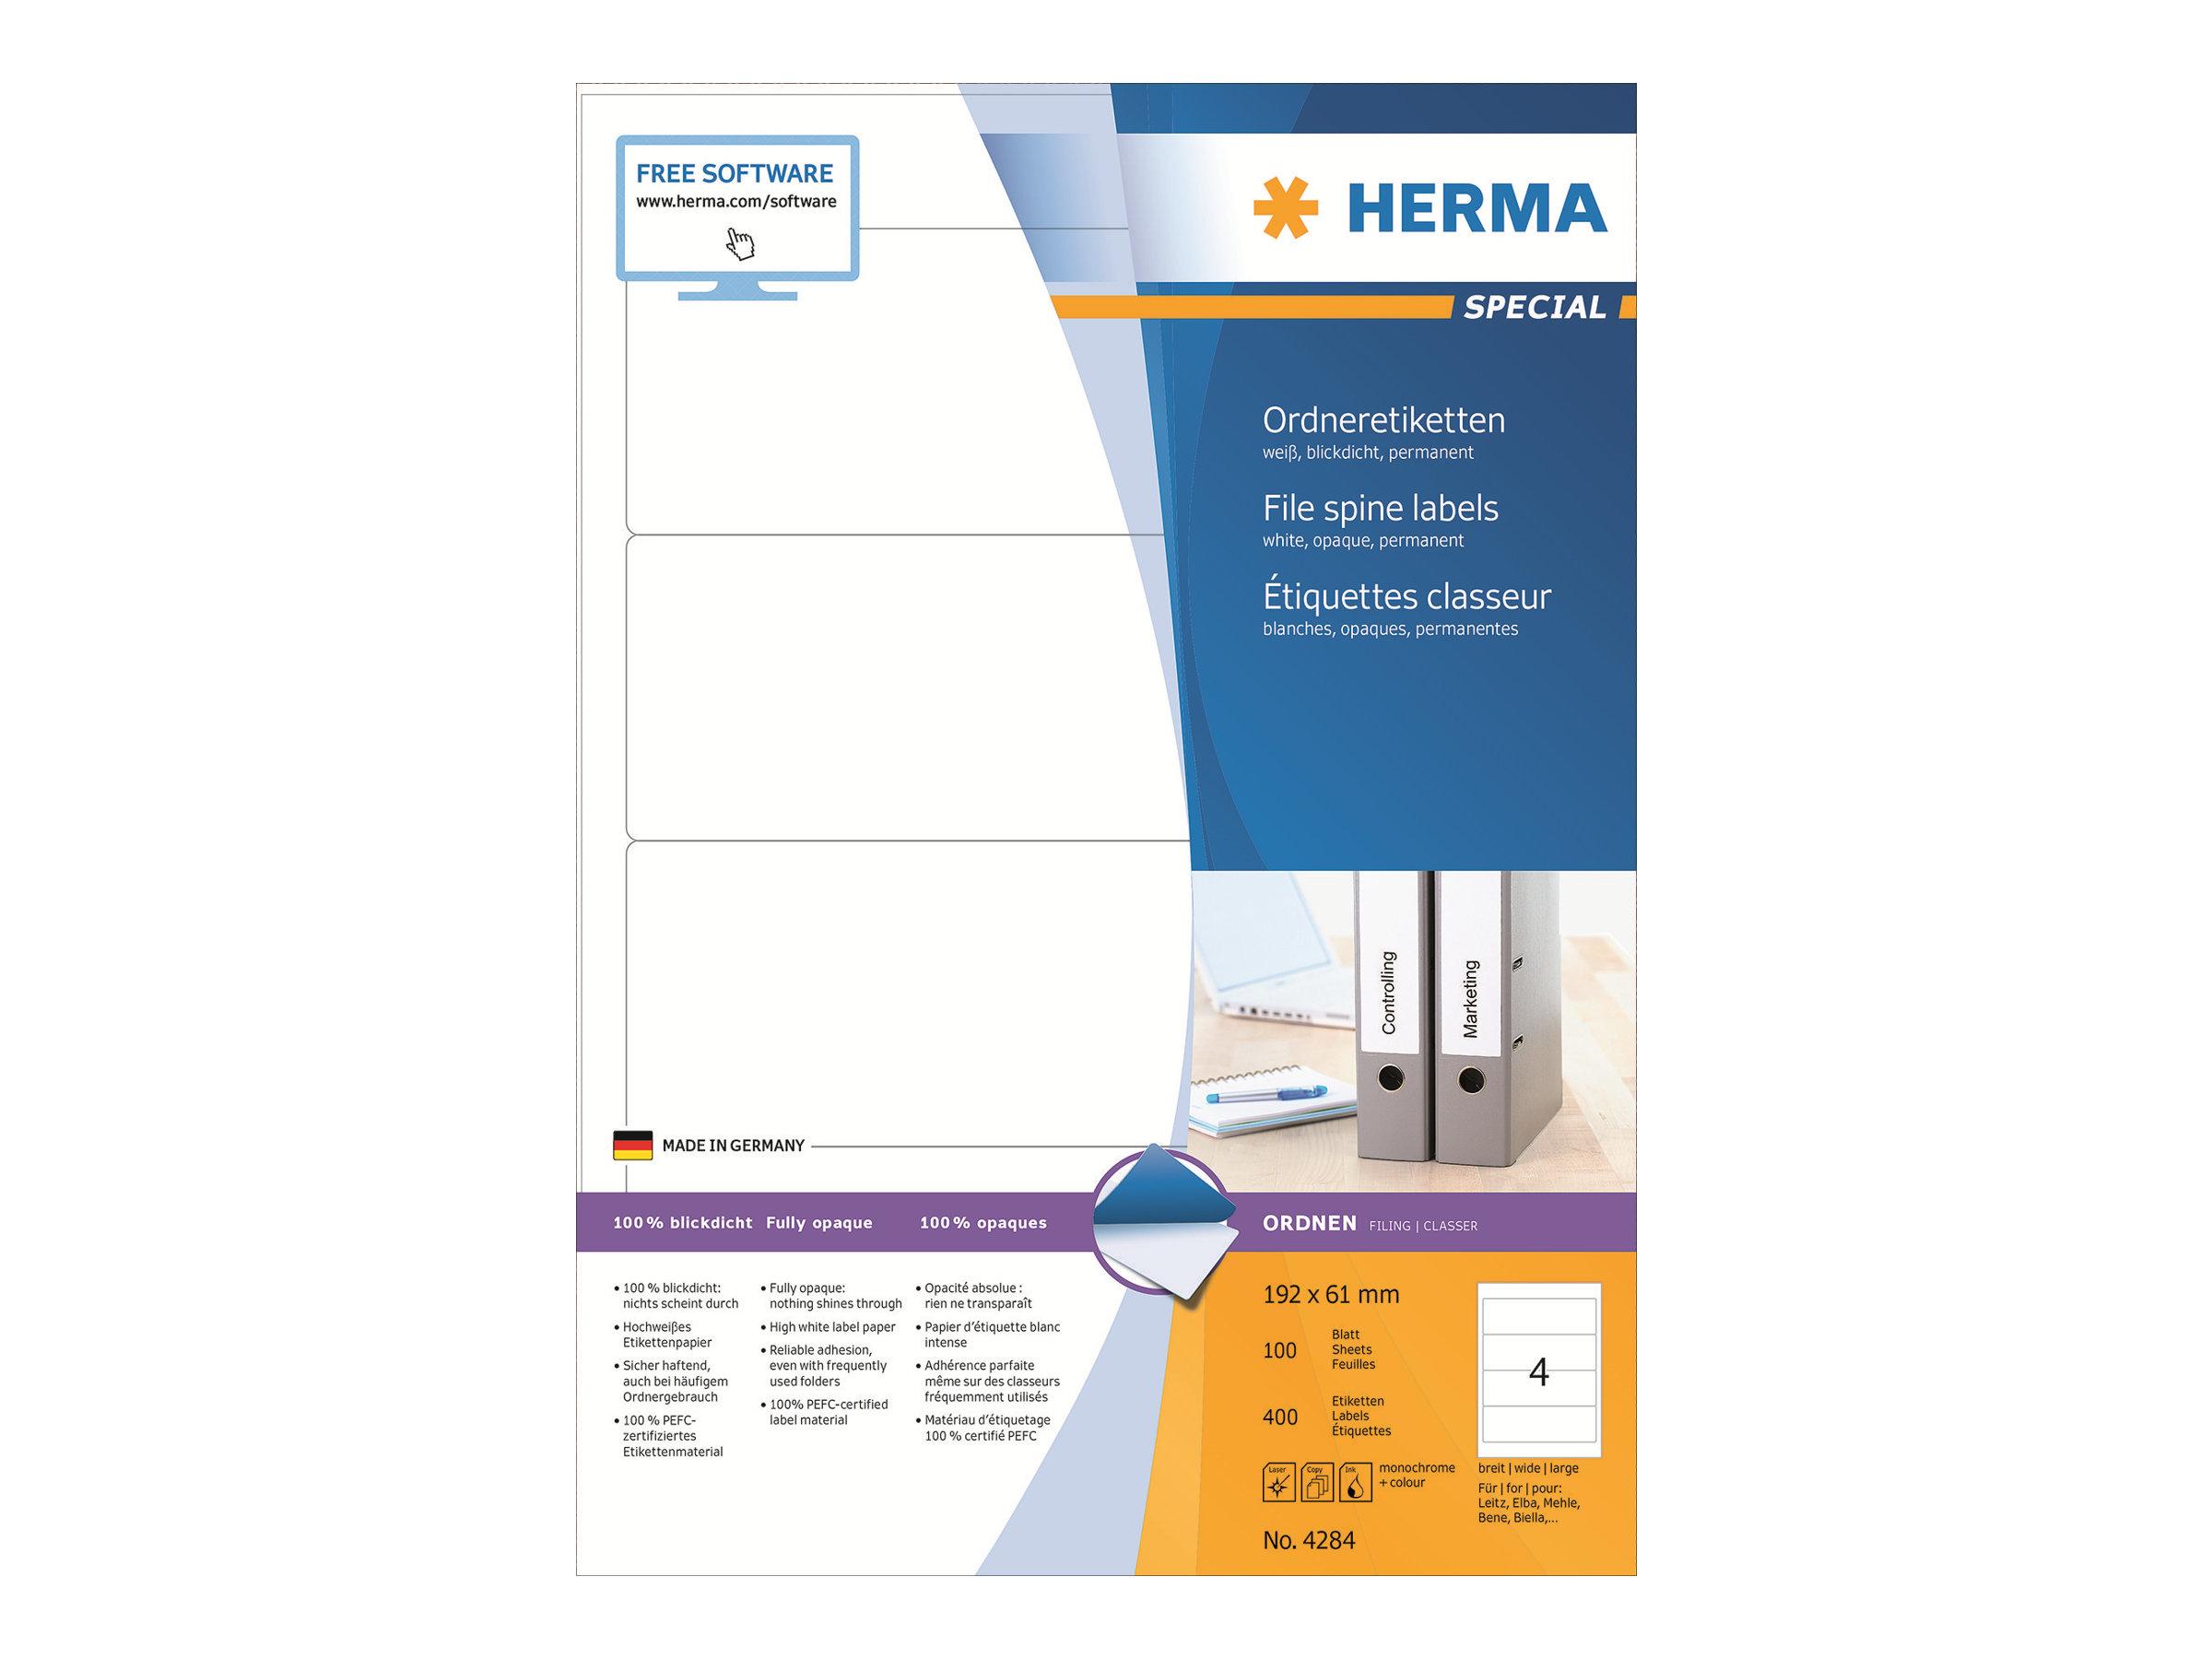 HERMA Special - Papier - matt - permanent selbstklebend - weiß - 192 x 61 mm 400 Etikett(en) (100 Bogen x 4)